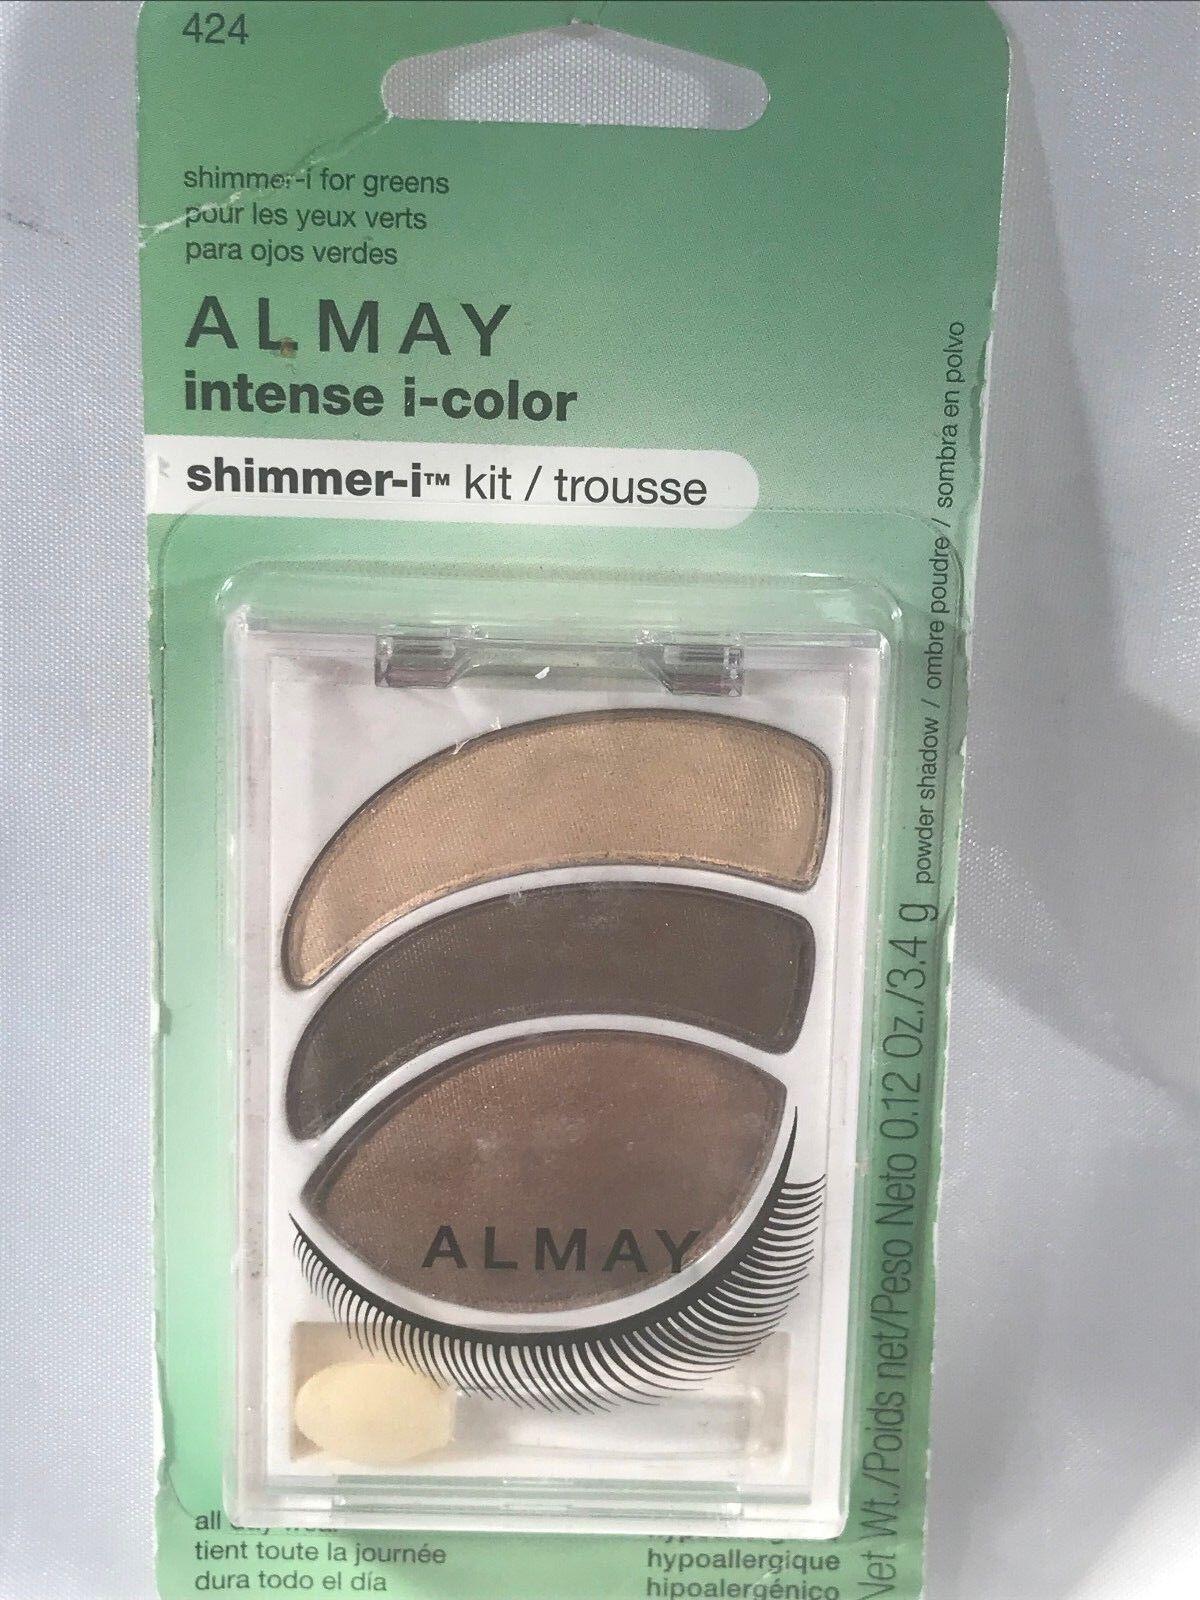 Almay Intense i-Color Satin-I Kit Powder Eye Shadow, for Gre